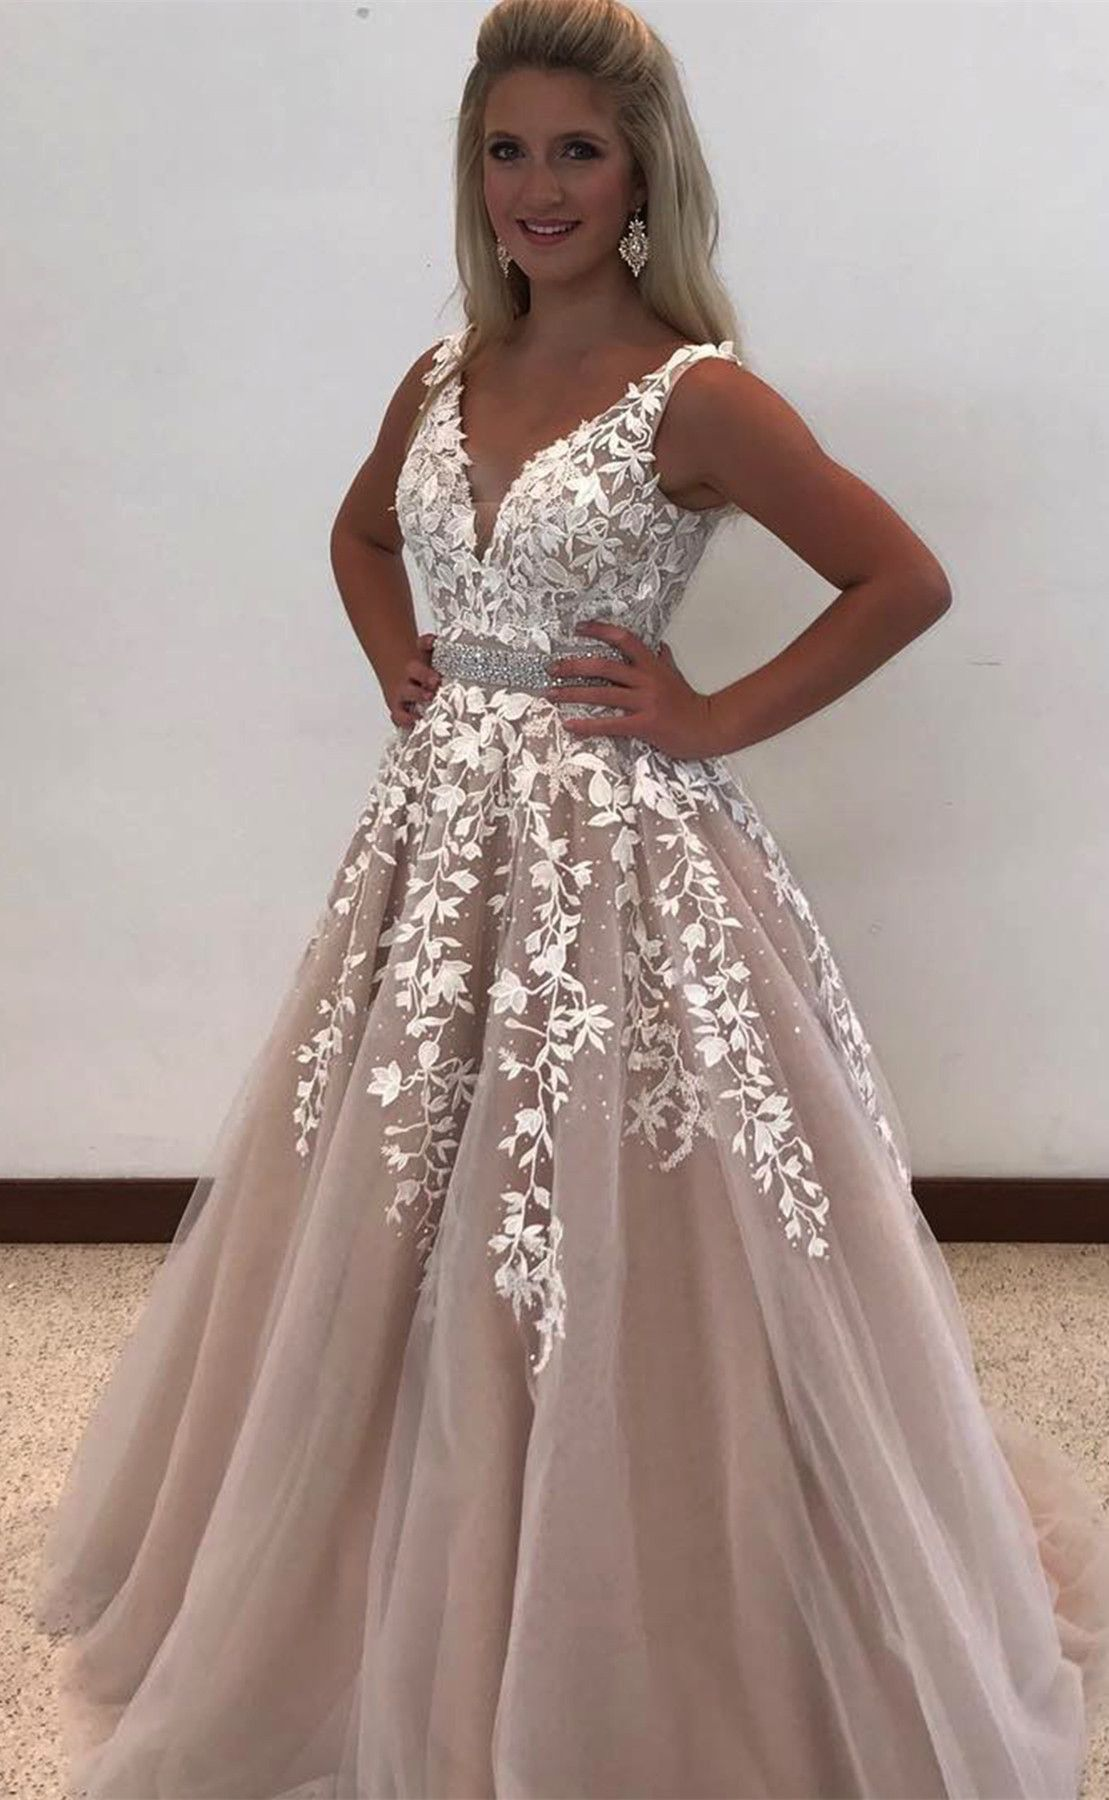 2018 prom dress, classic prom dress, long prom dress, party dress ...